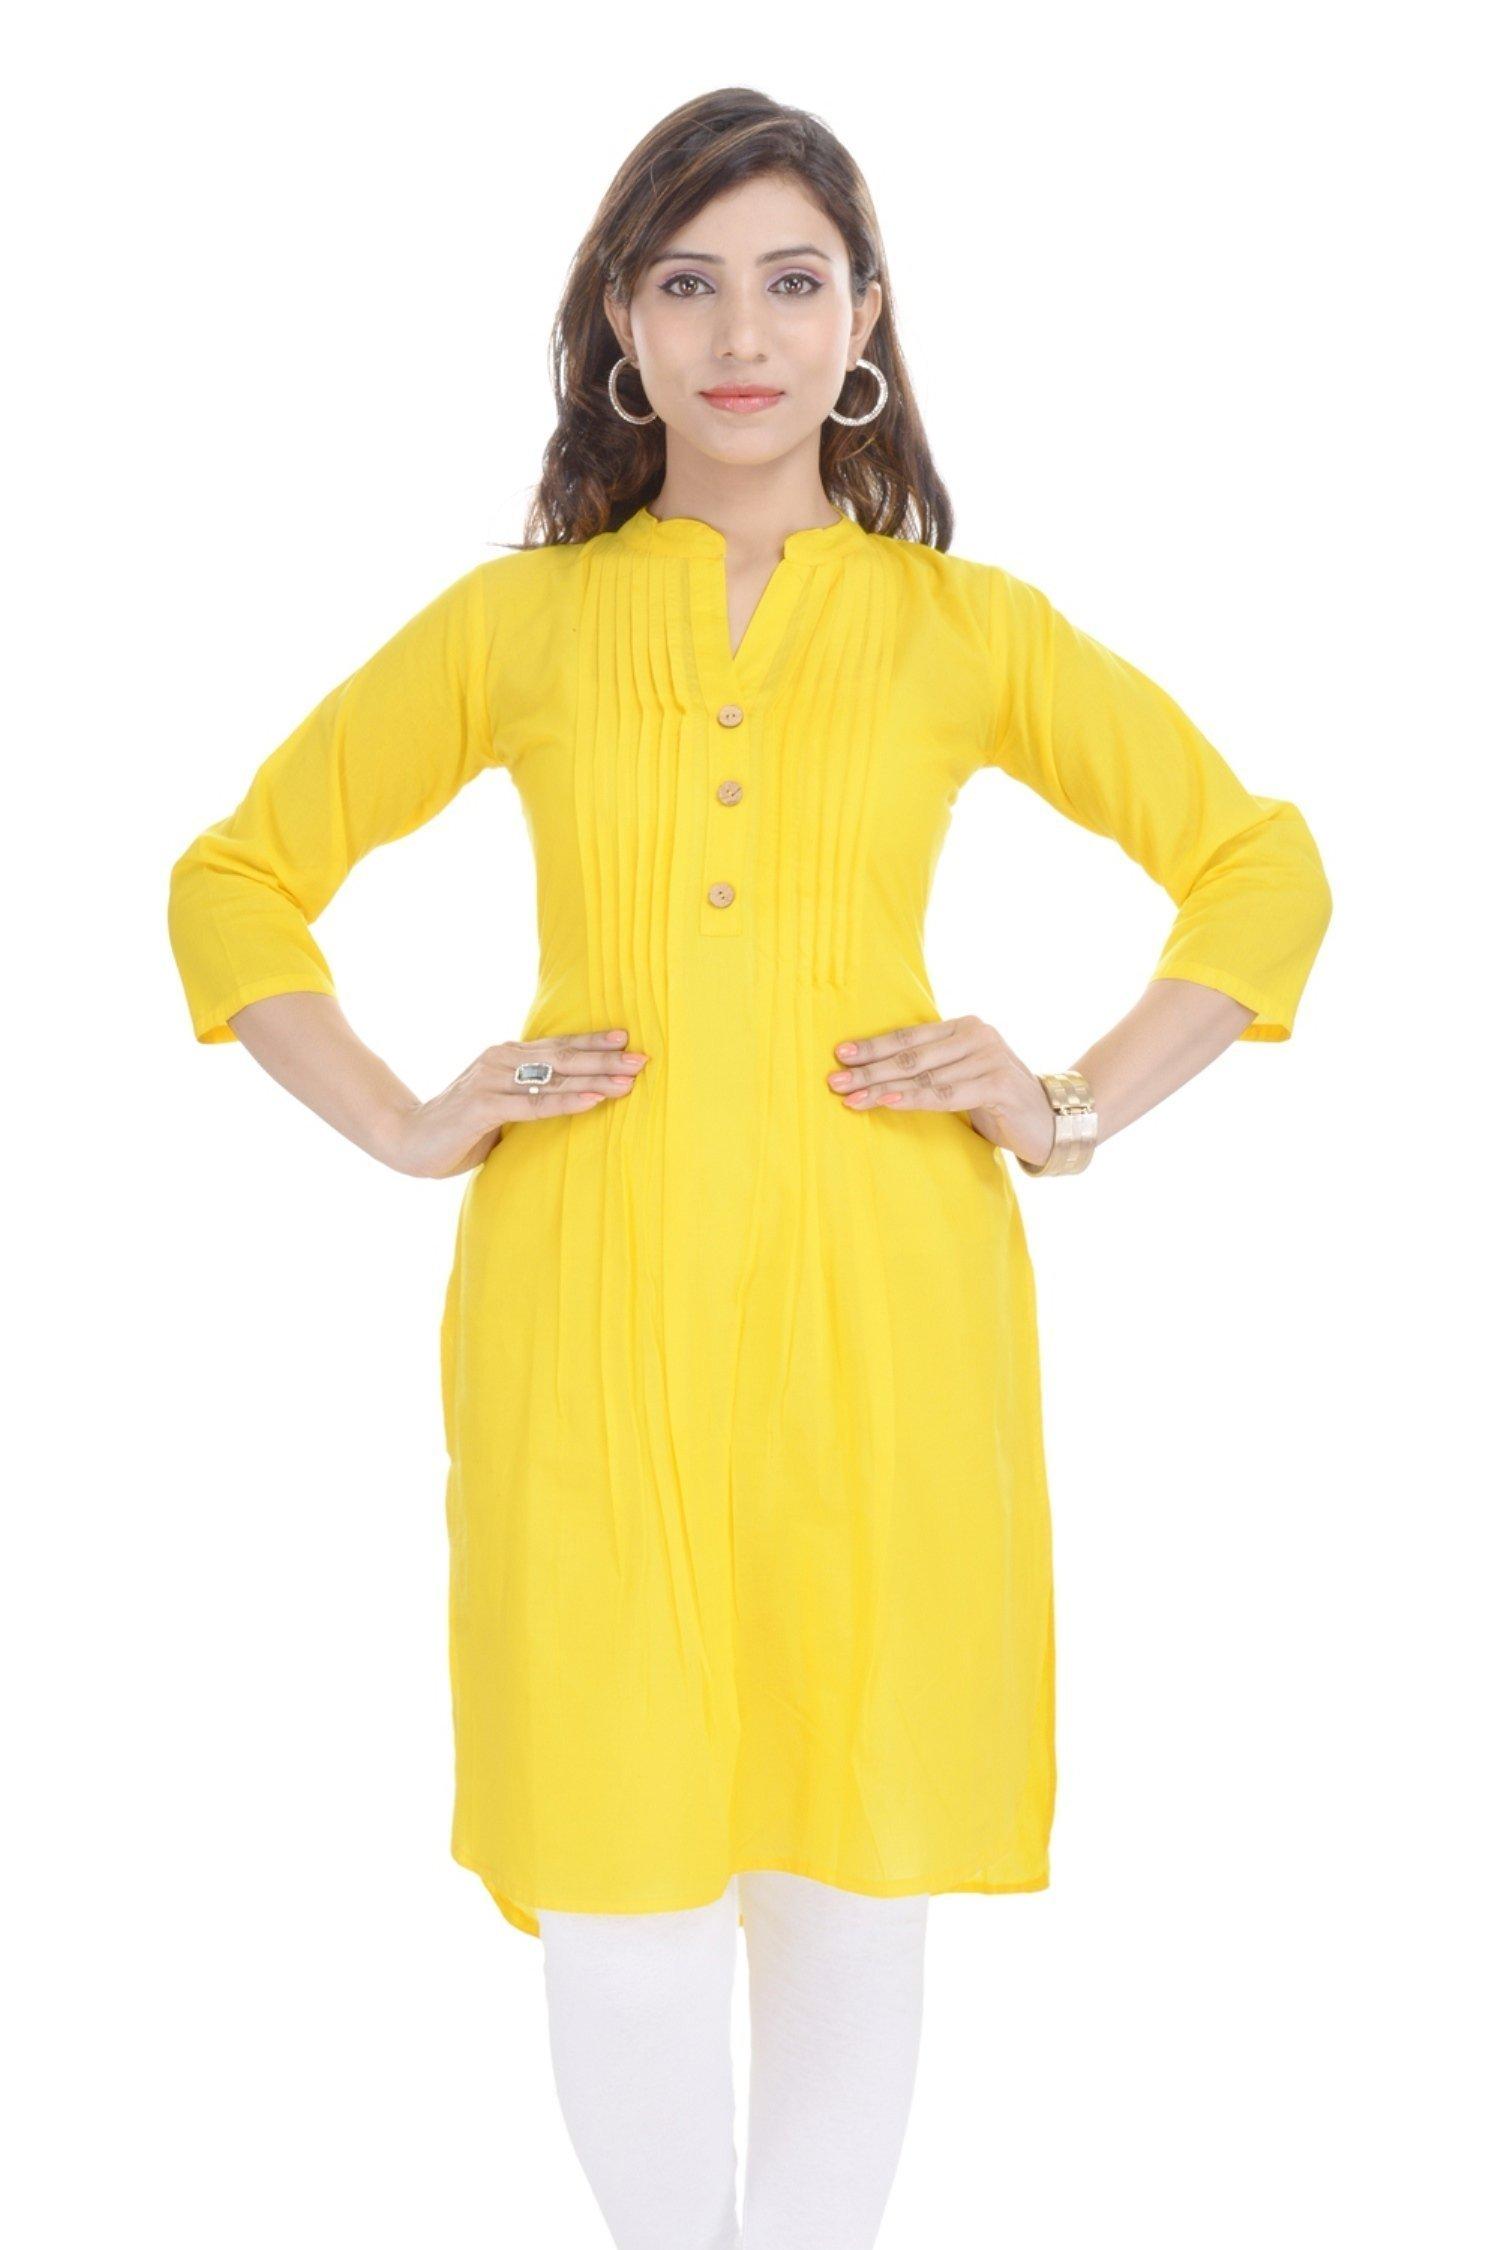 Chichi Indian Women Kurta Kurti 3/4 Sleeve XX-Large Size Plain Straight Yellow Top